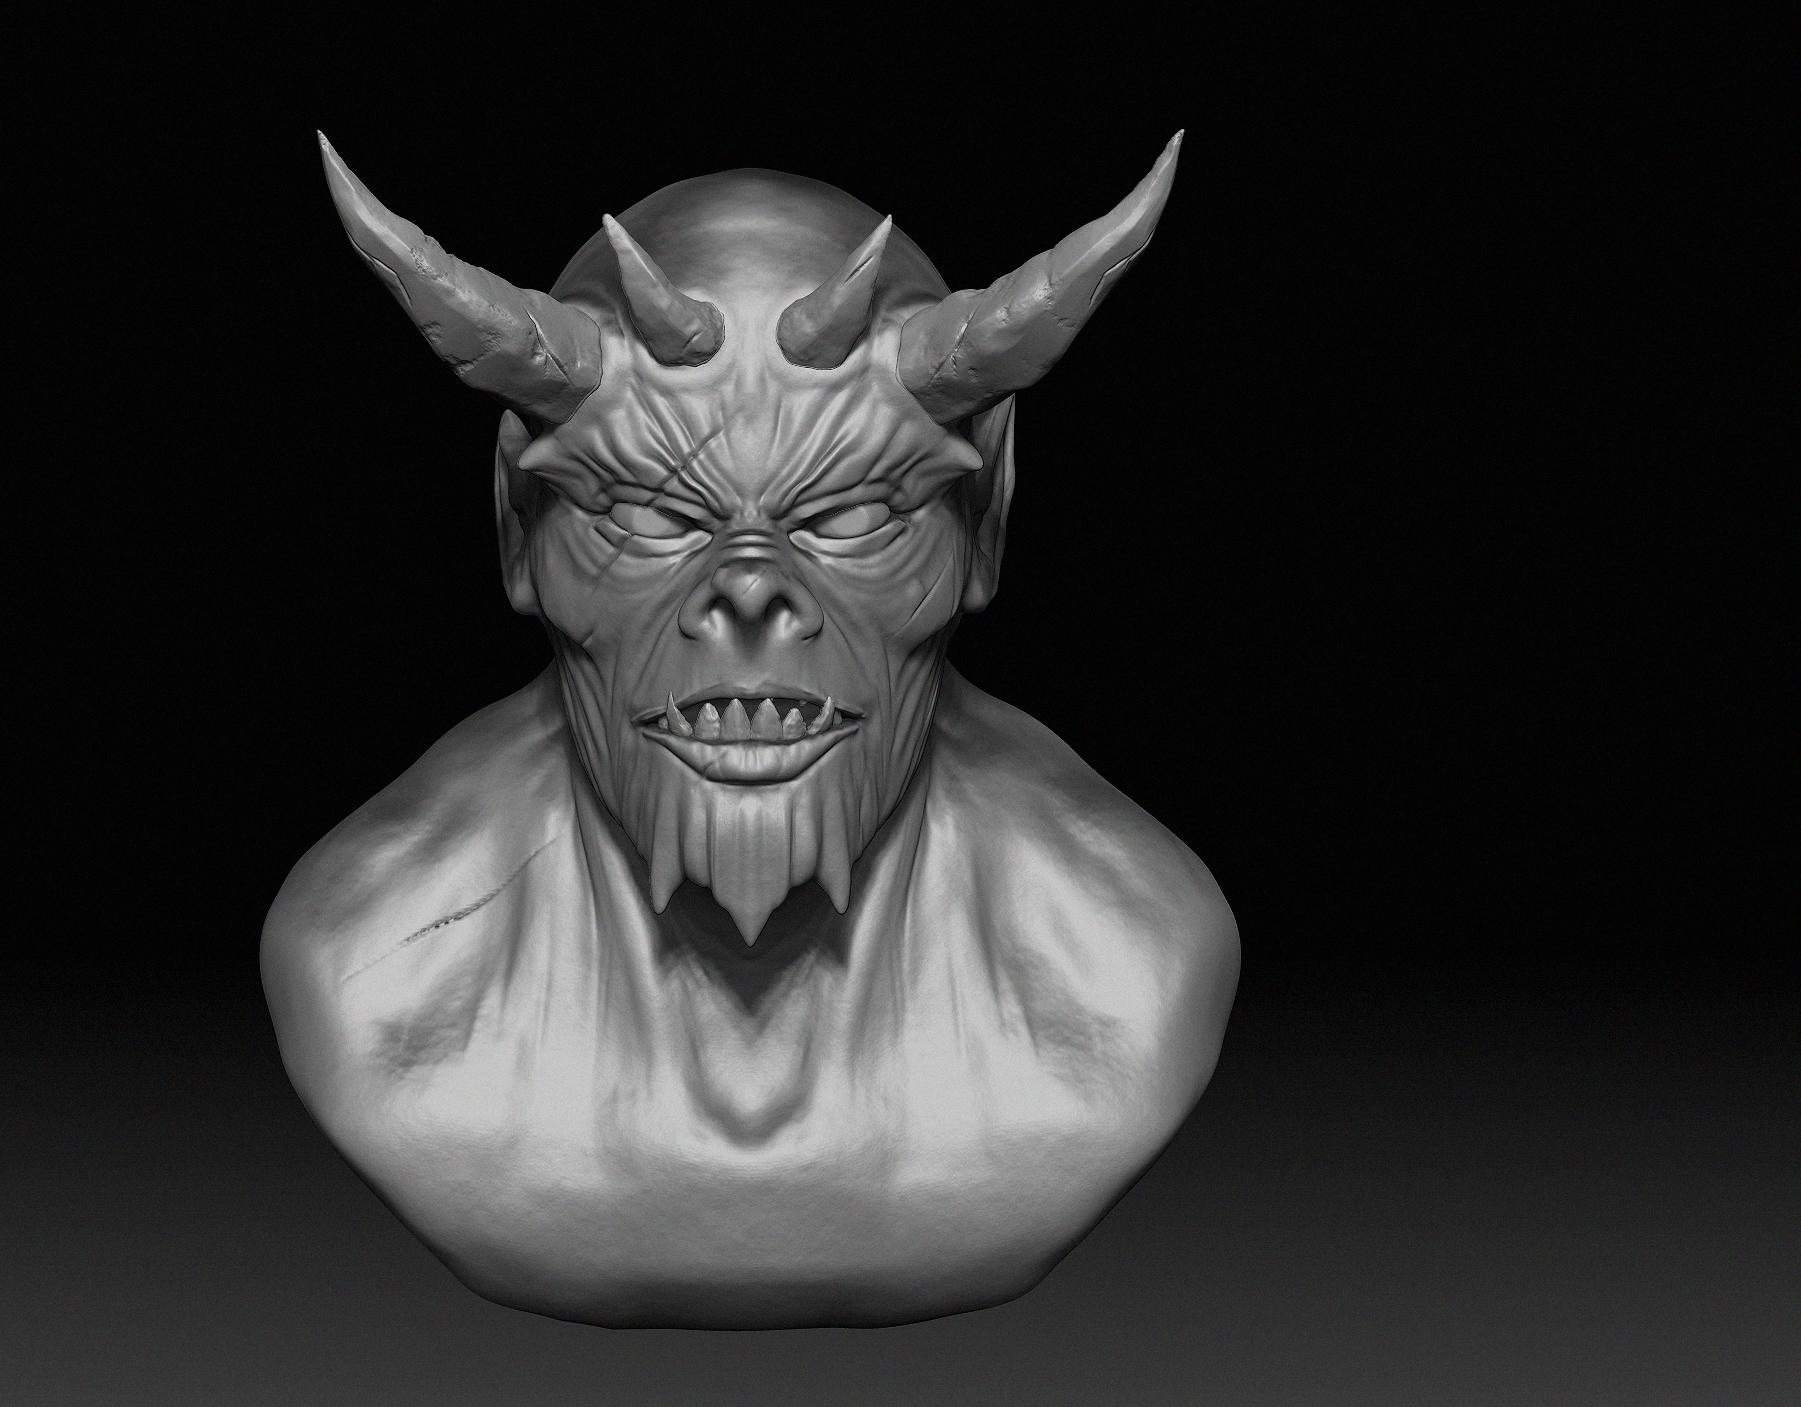 demon_head_by_captainapoc-d9apwio.jpg